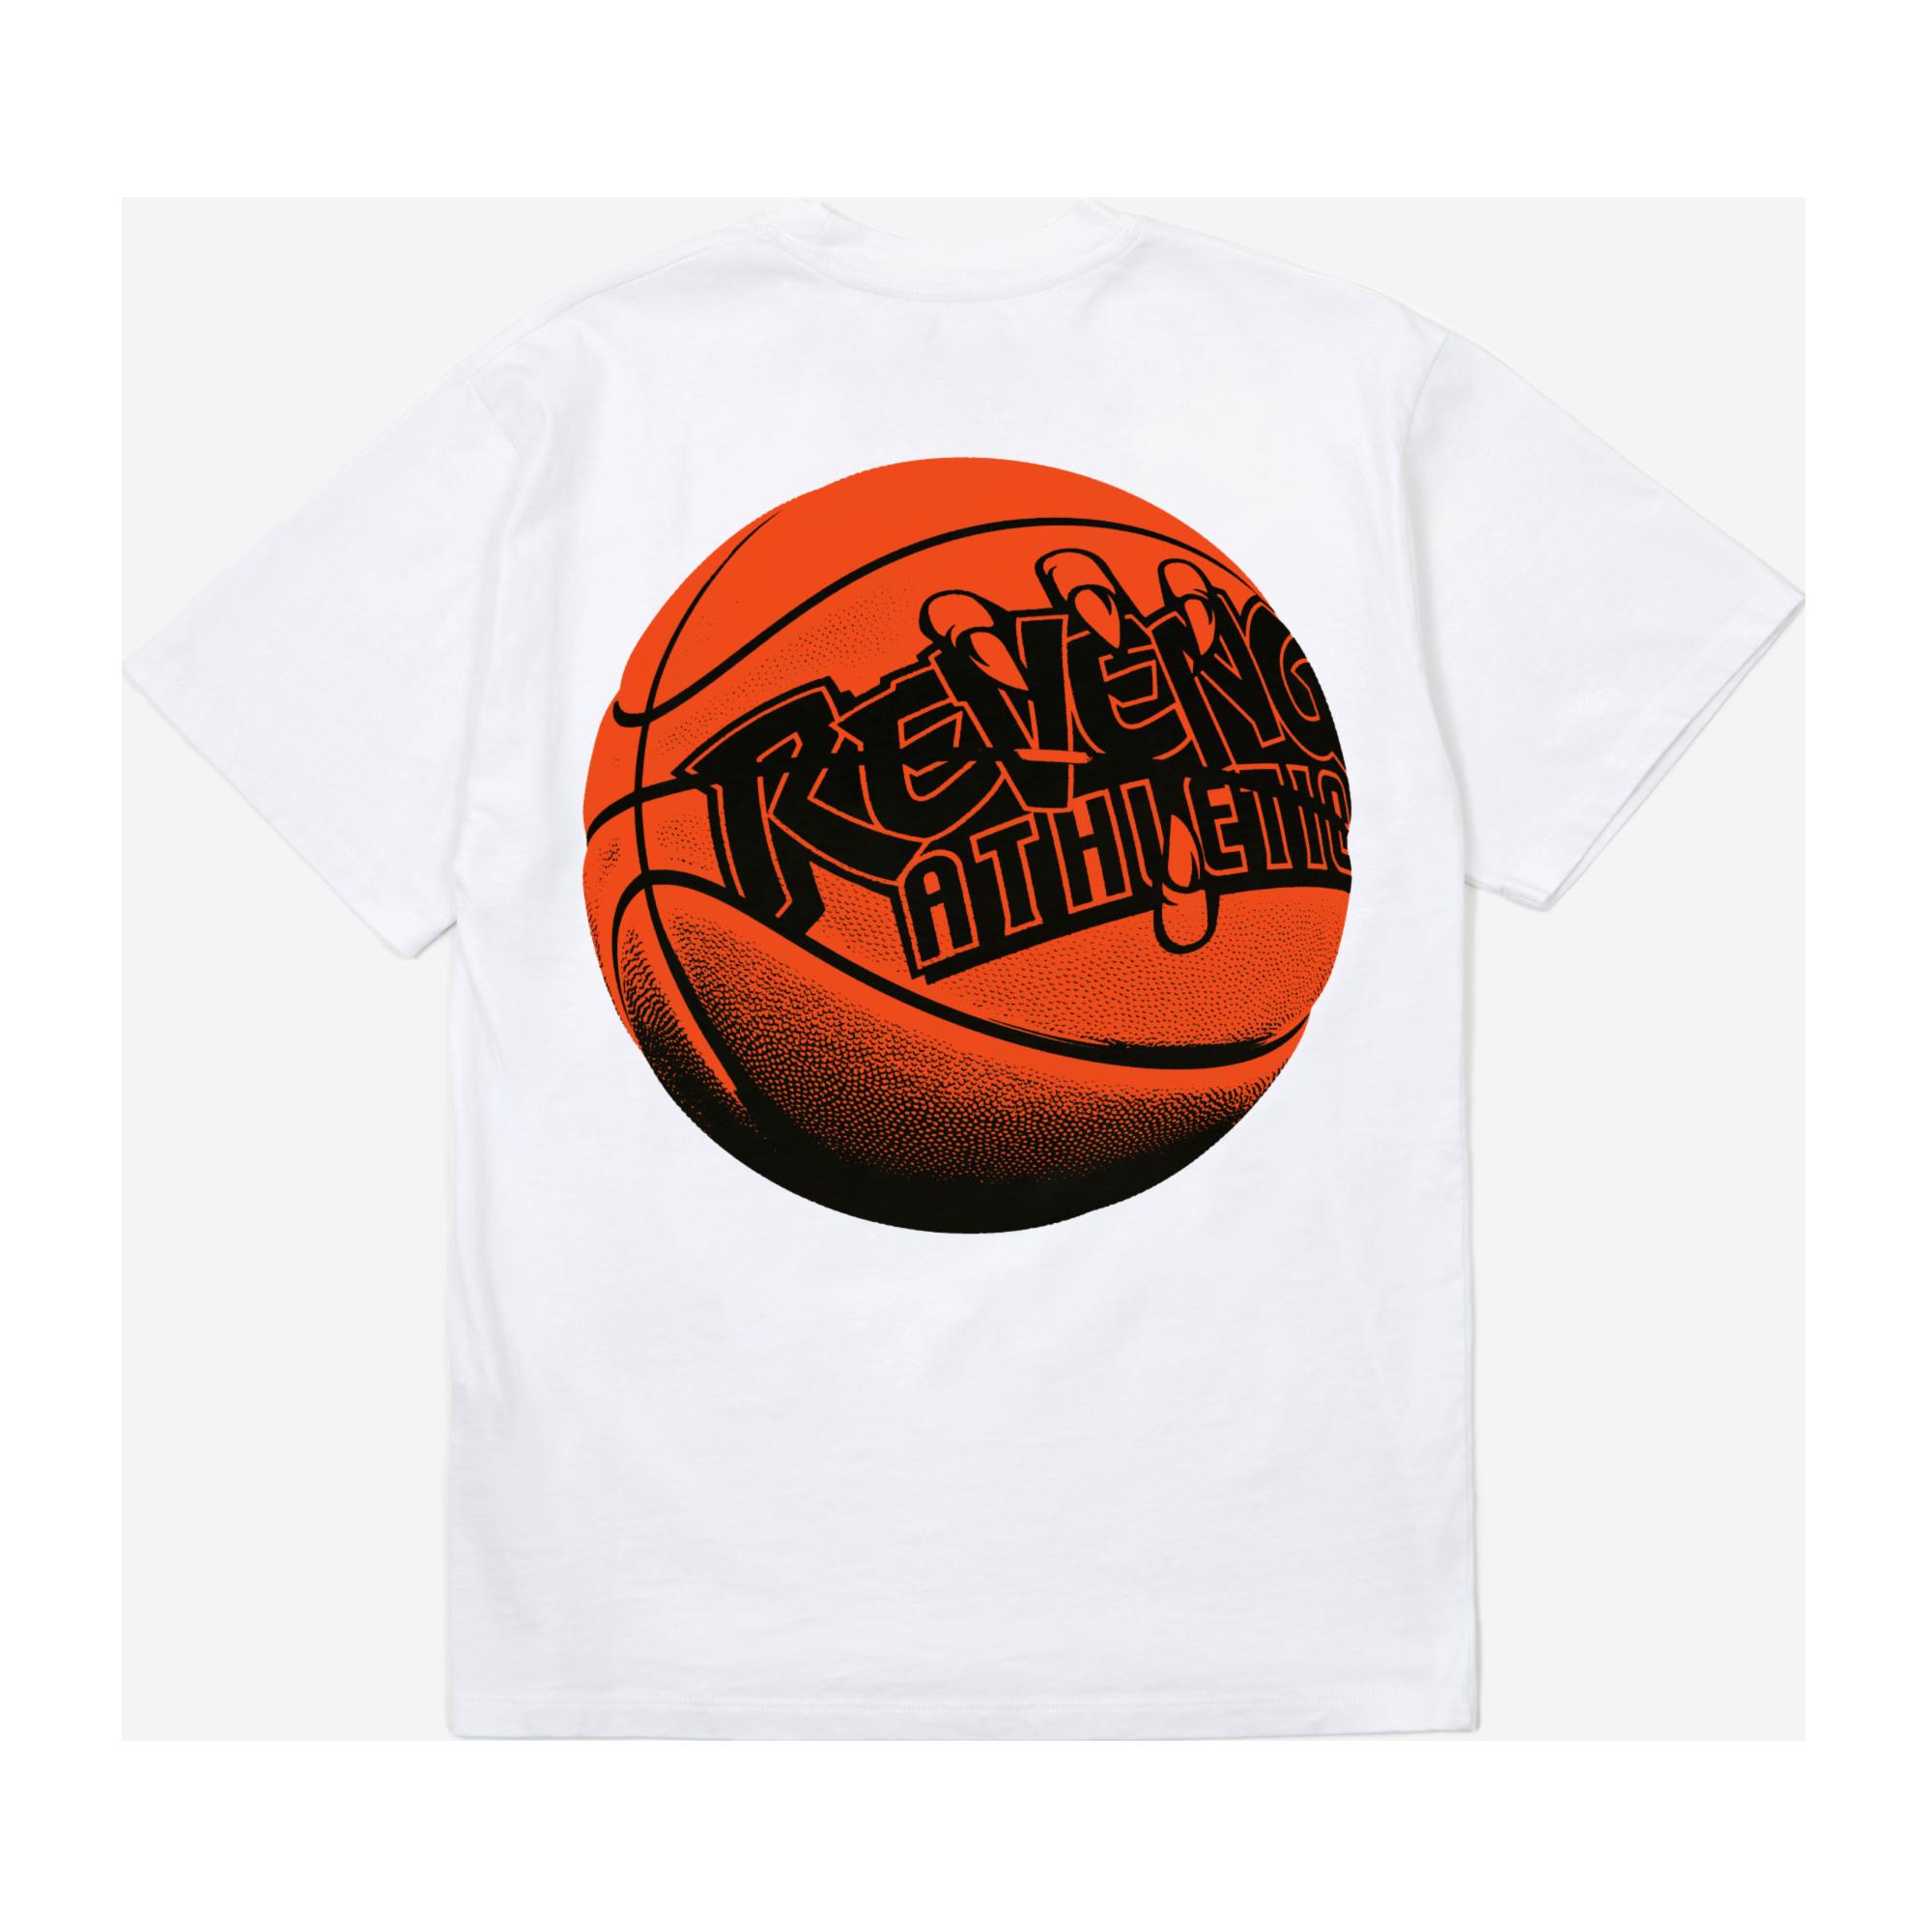 Flu Game LP + T-Shirt Bundle - White